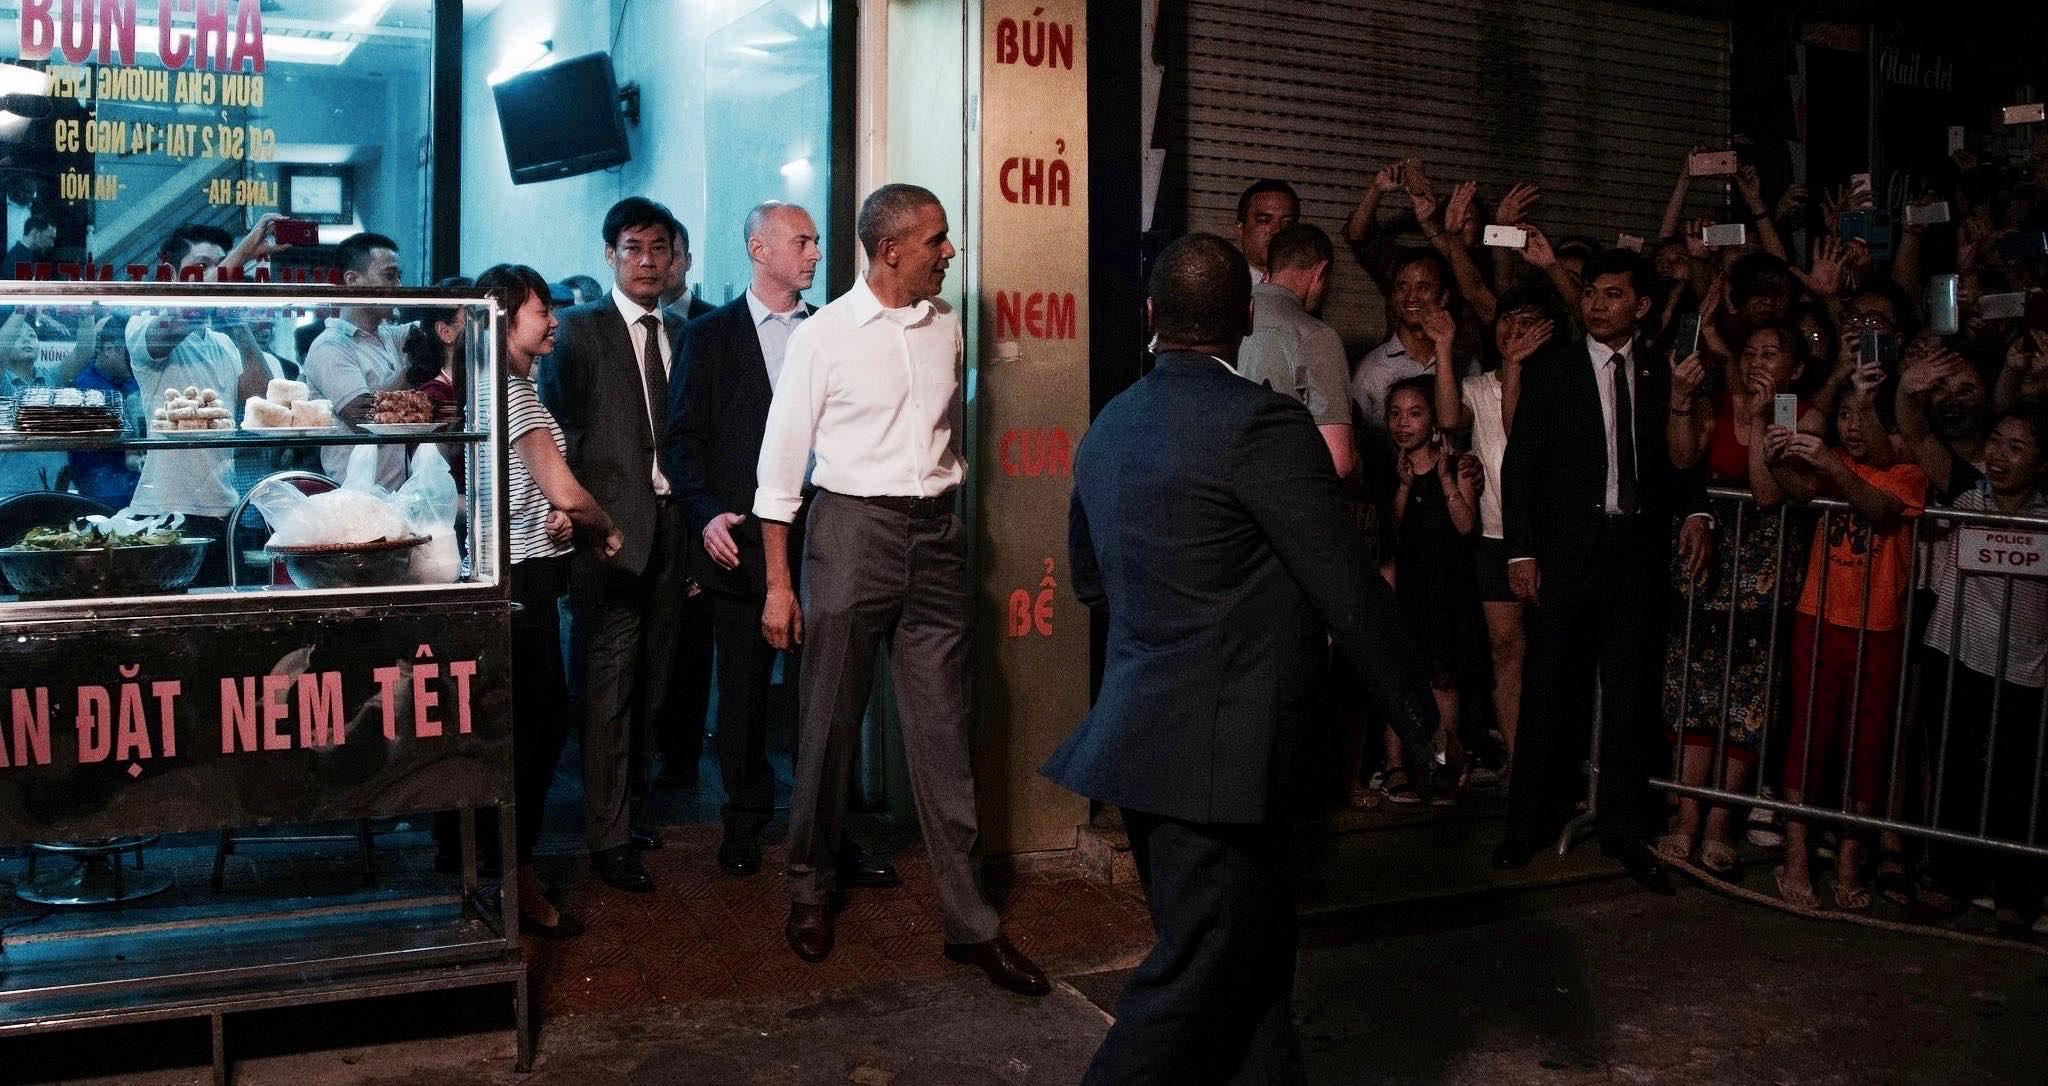 The Story Behind Obama's Bun Cha